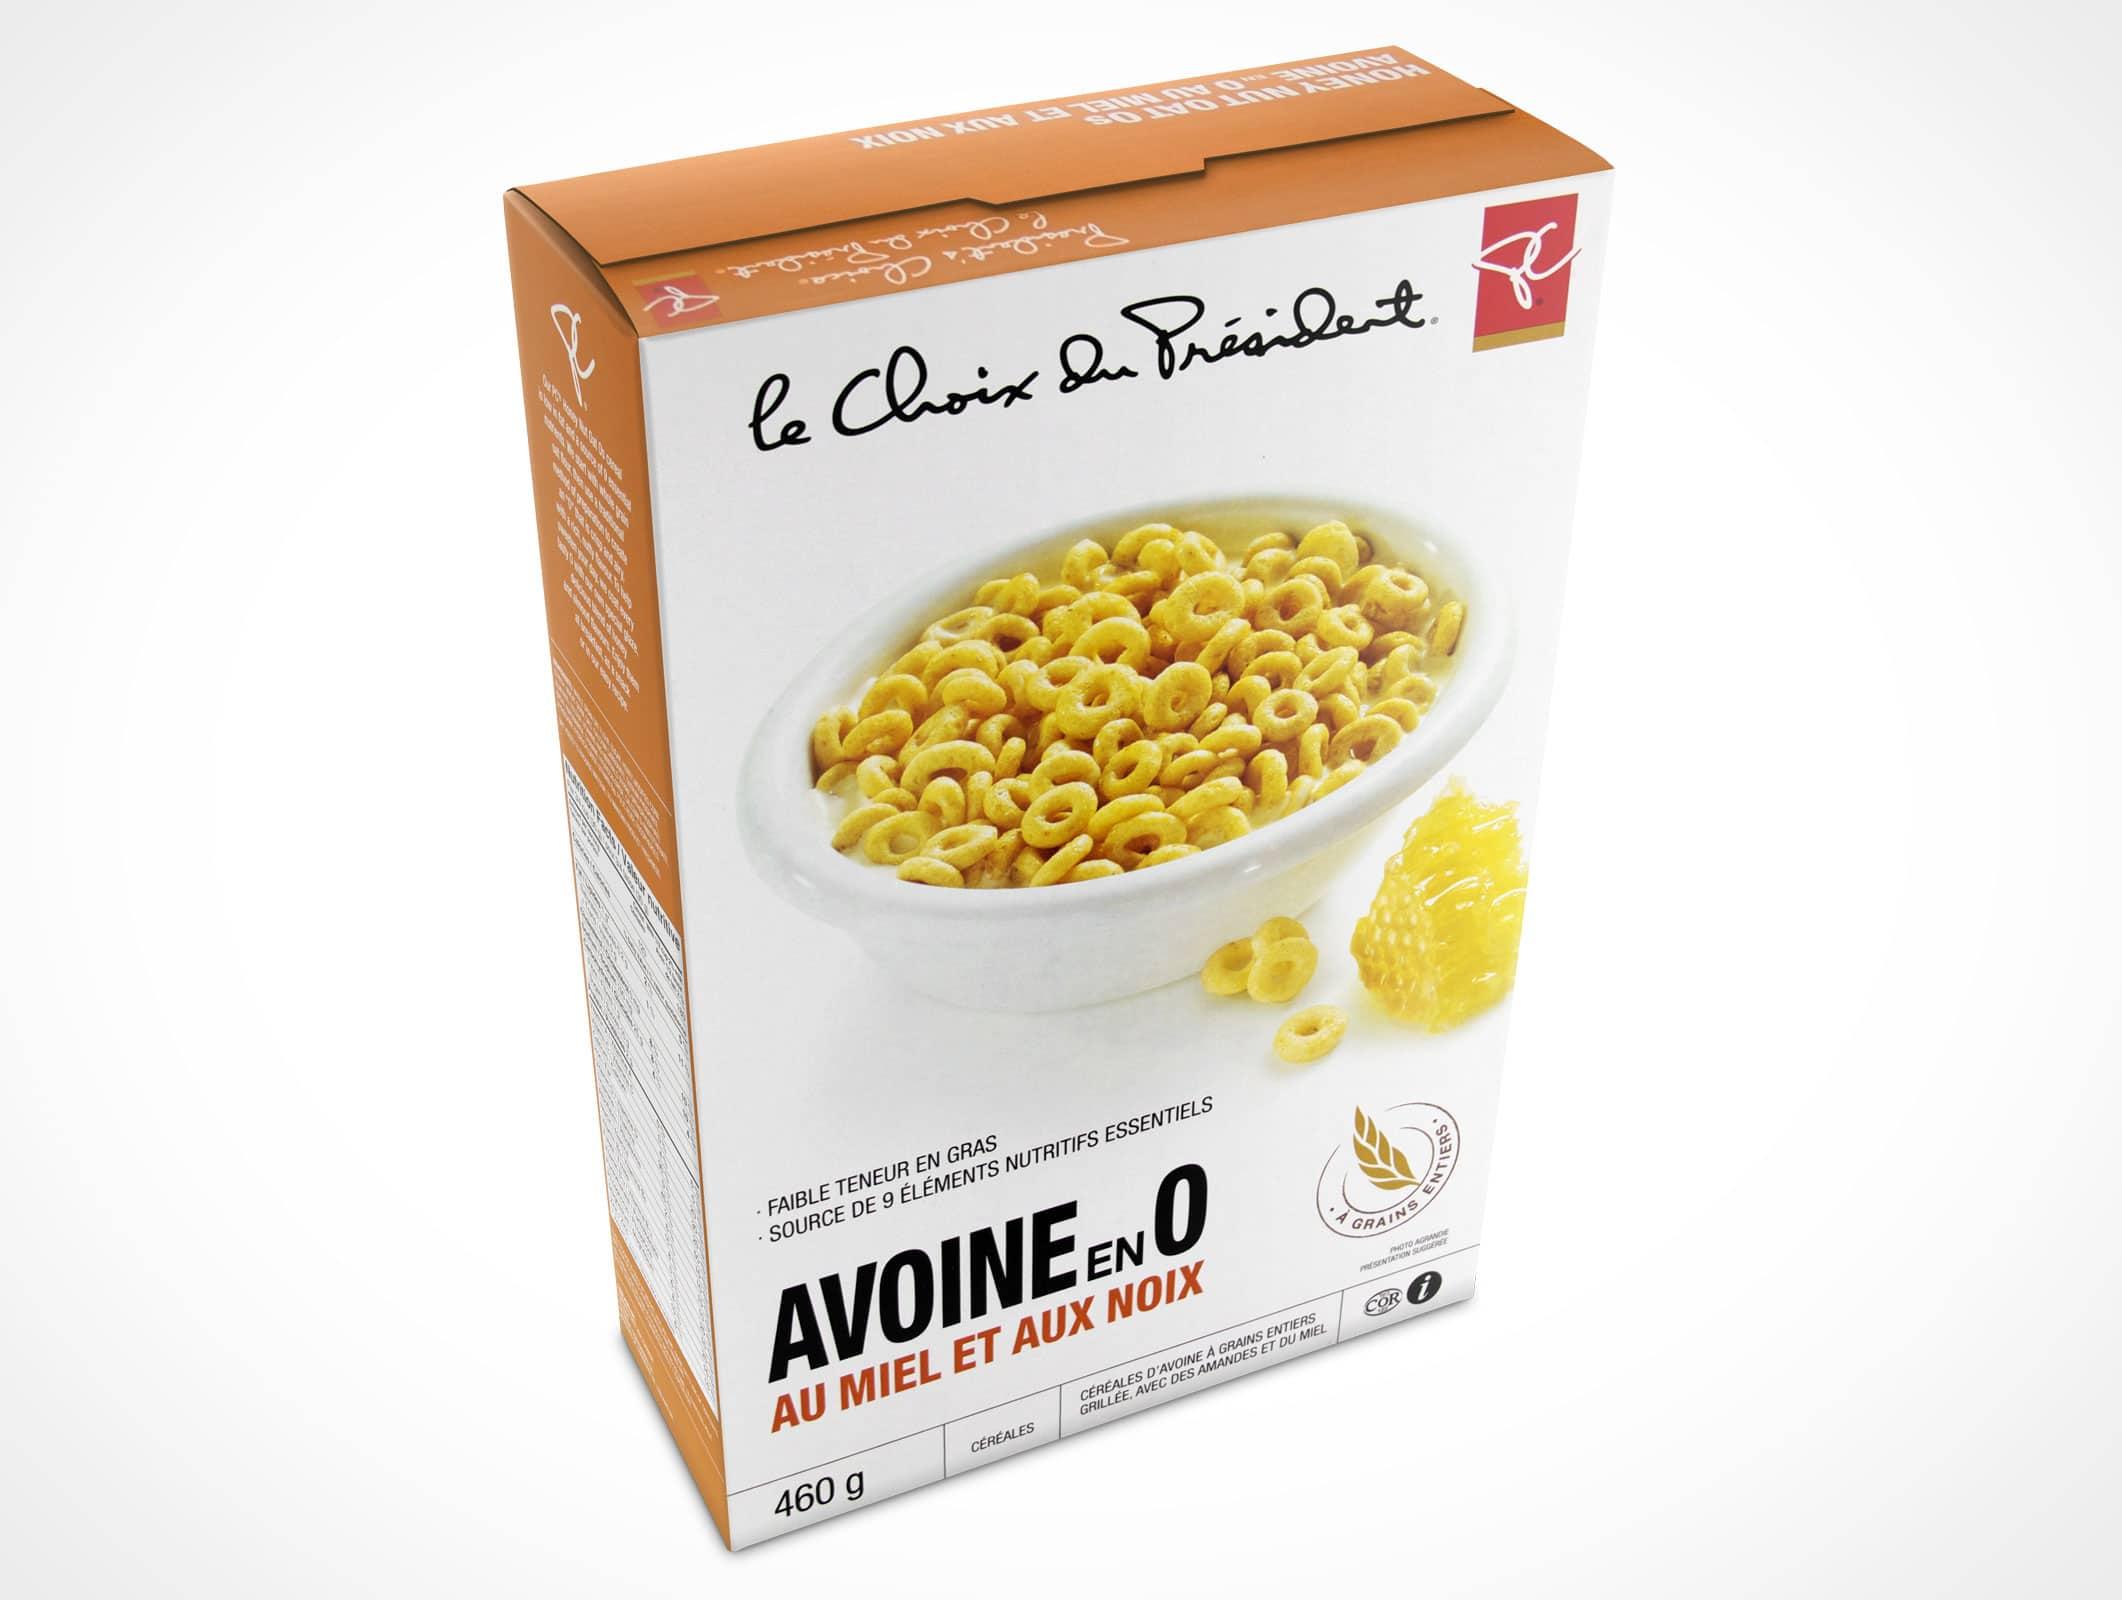 free cereal box design mockup in psd